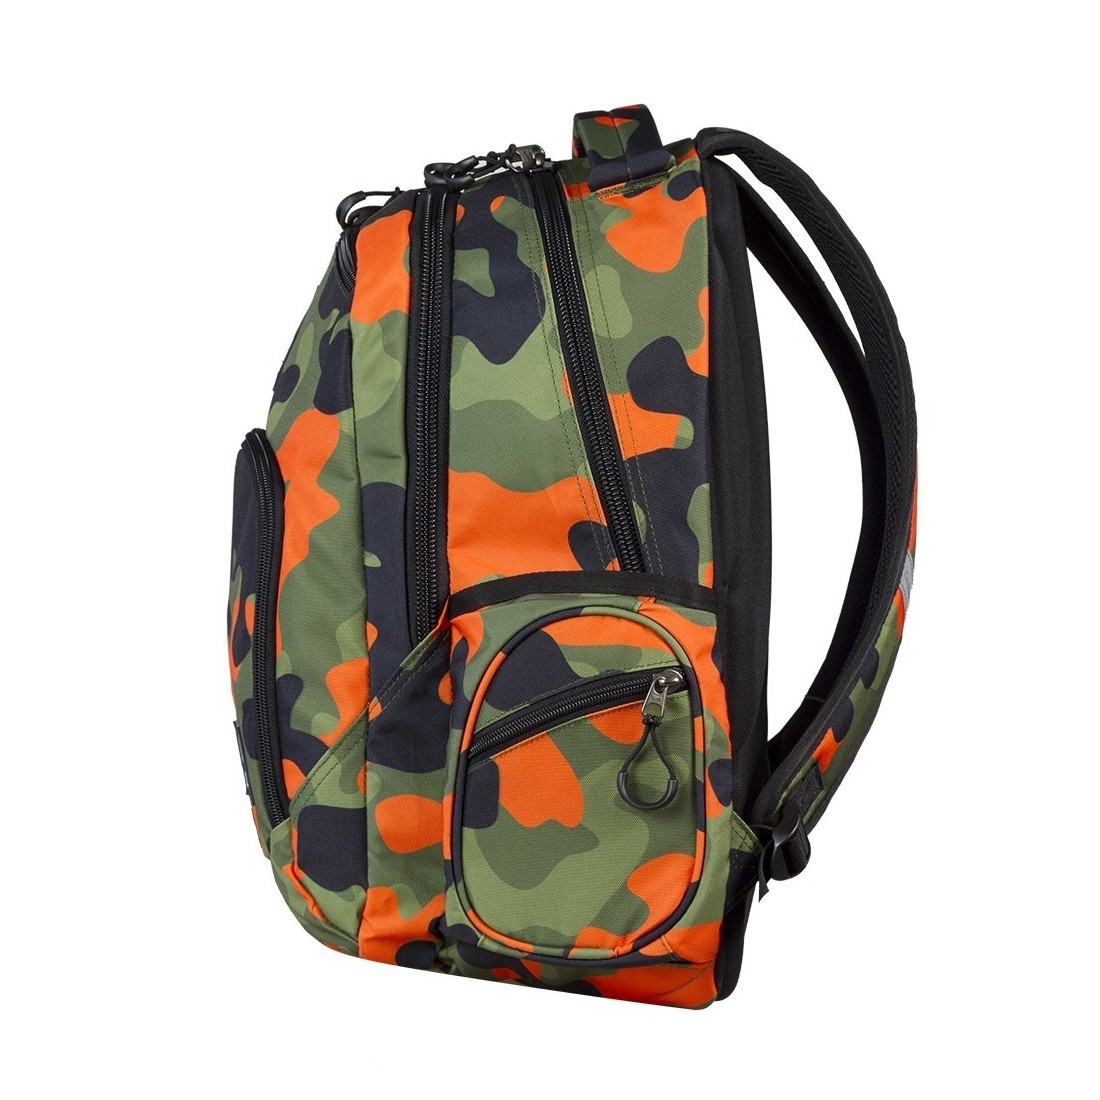 Plecak młodzieżowy COOLPACK BREAK MORO ORANGE CP 601 - plecak-tornister.pl